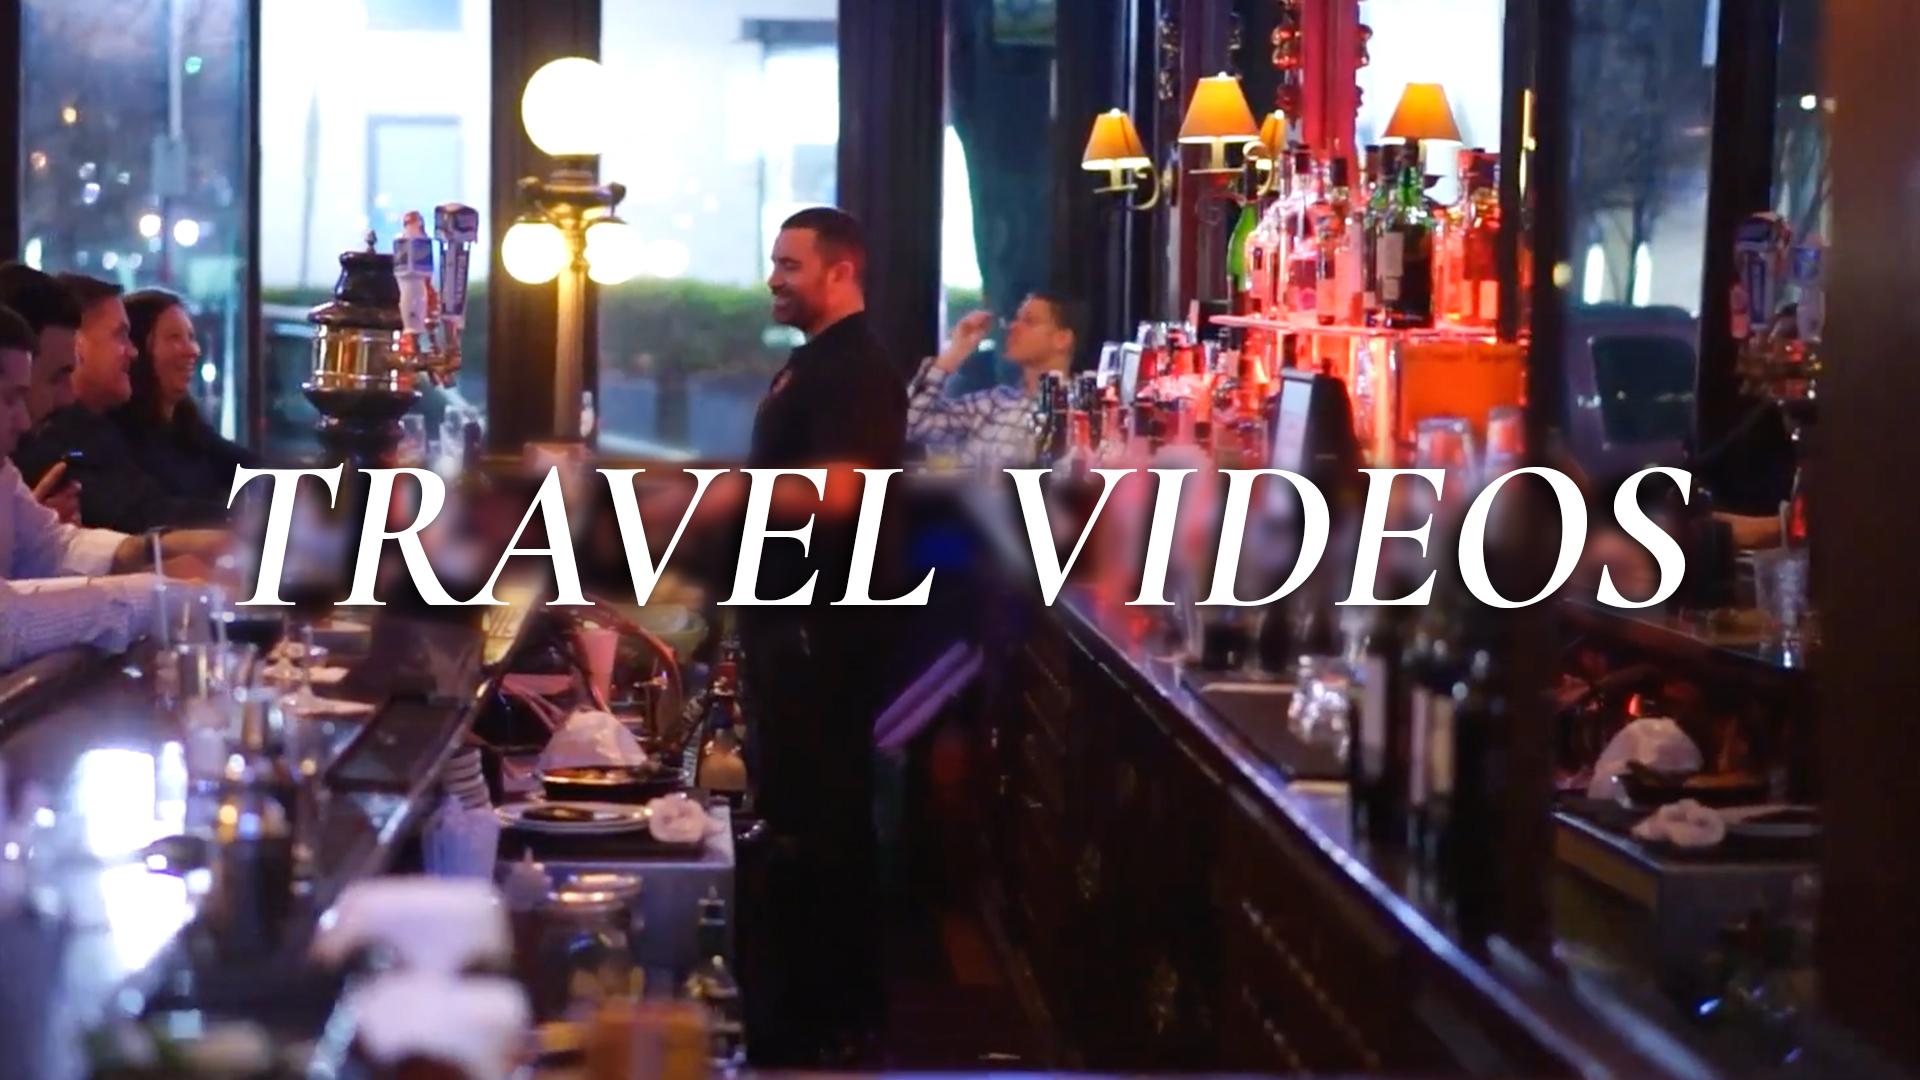 travel videos.jpg